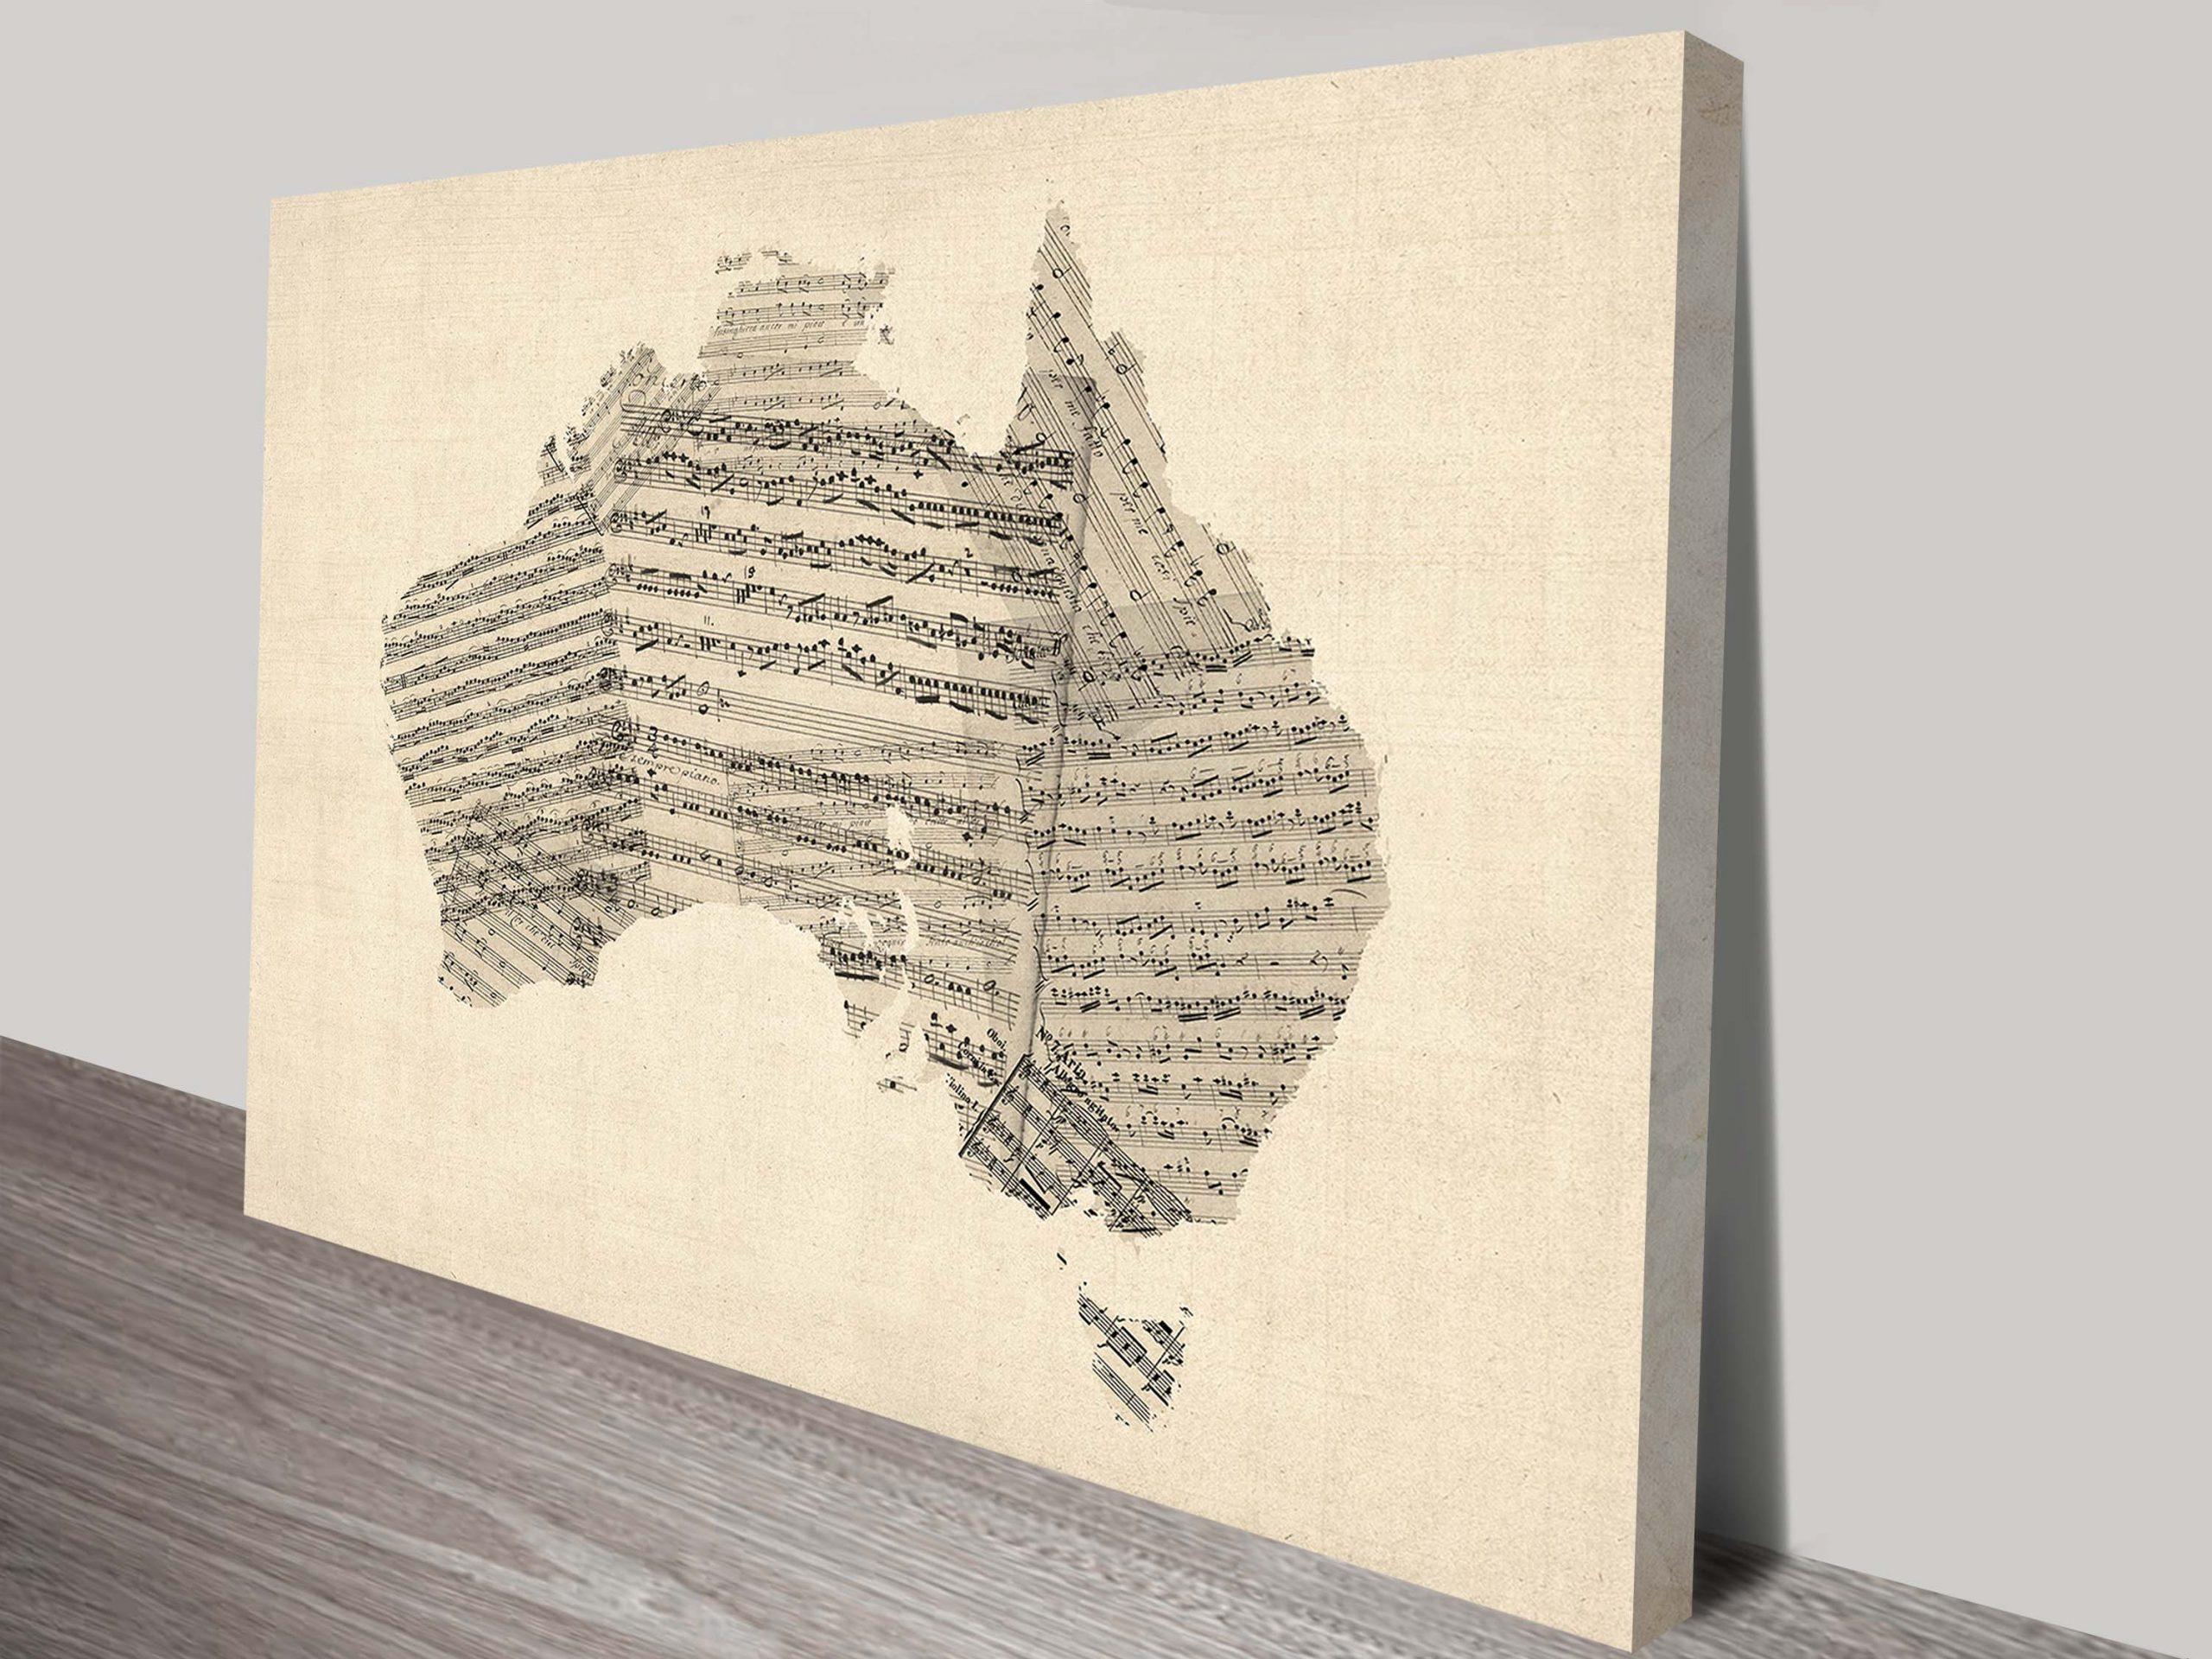 Vintage Sheet Music Print of Australia by Michael Tompsett